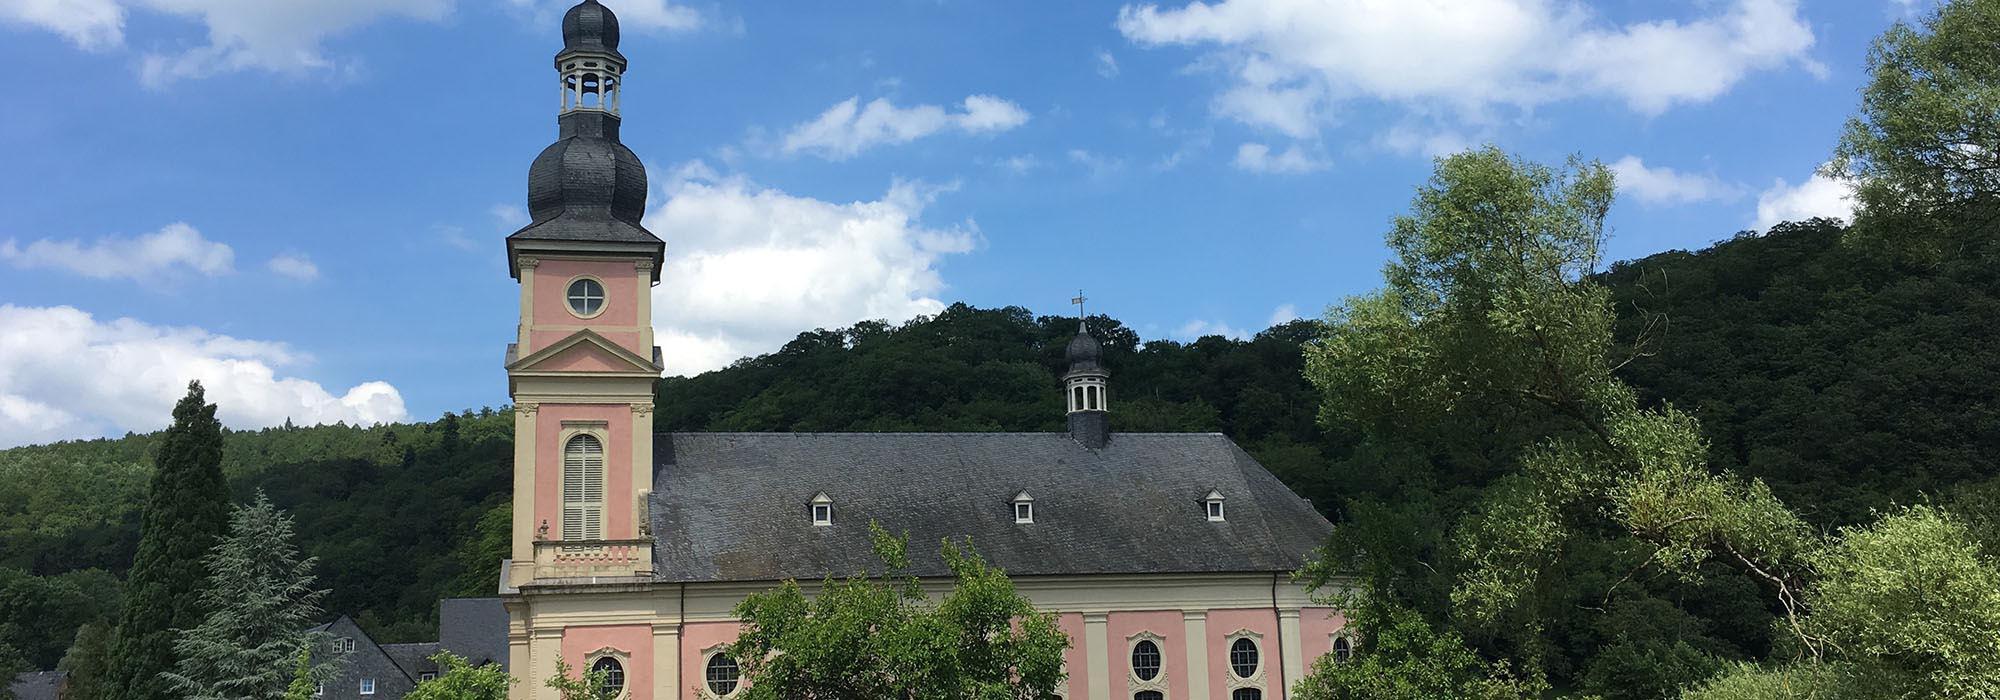 Springiersbach-IMG_1583